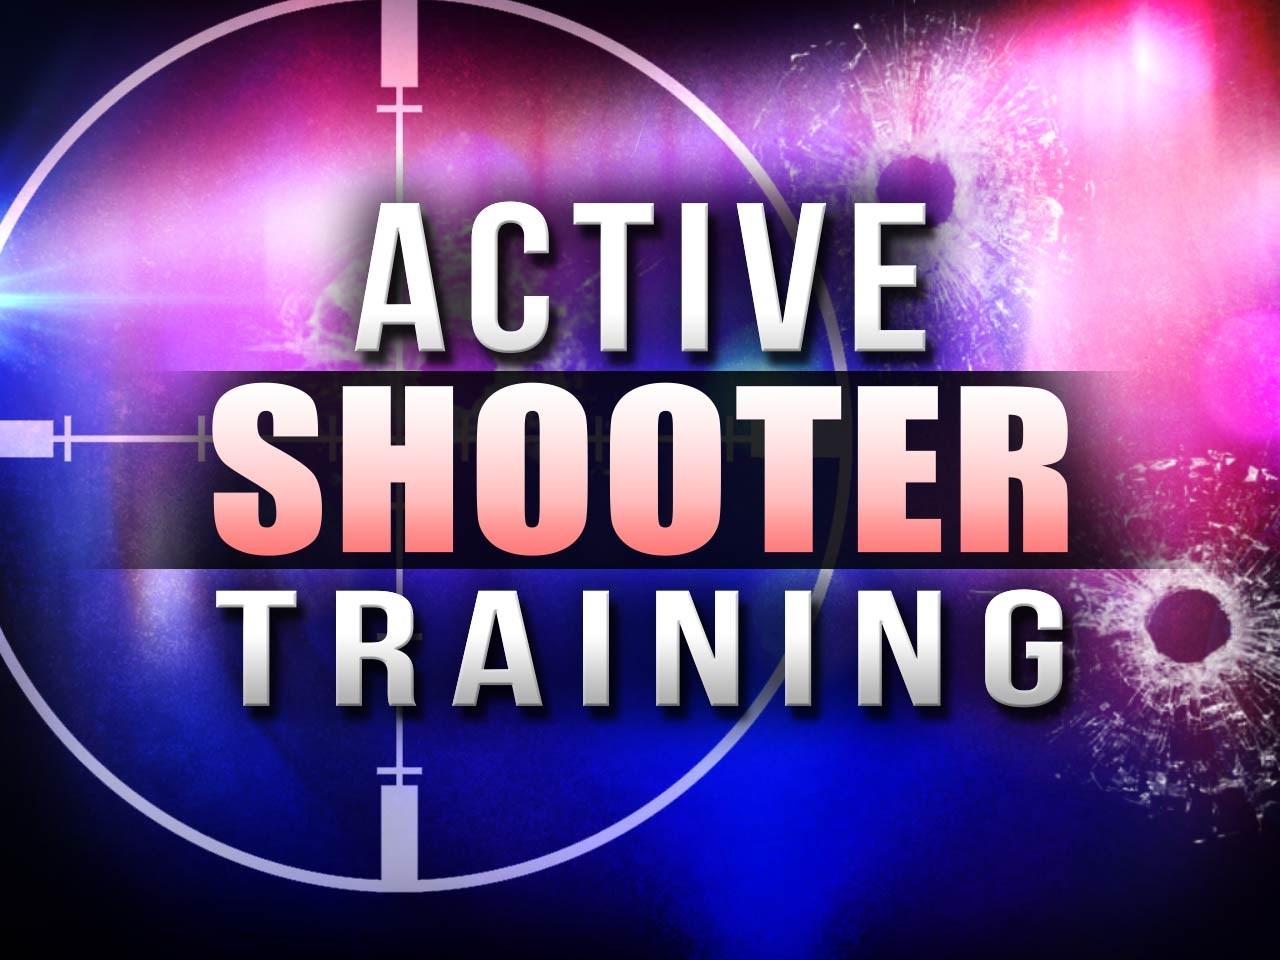 active shooter training.jpg